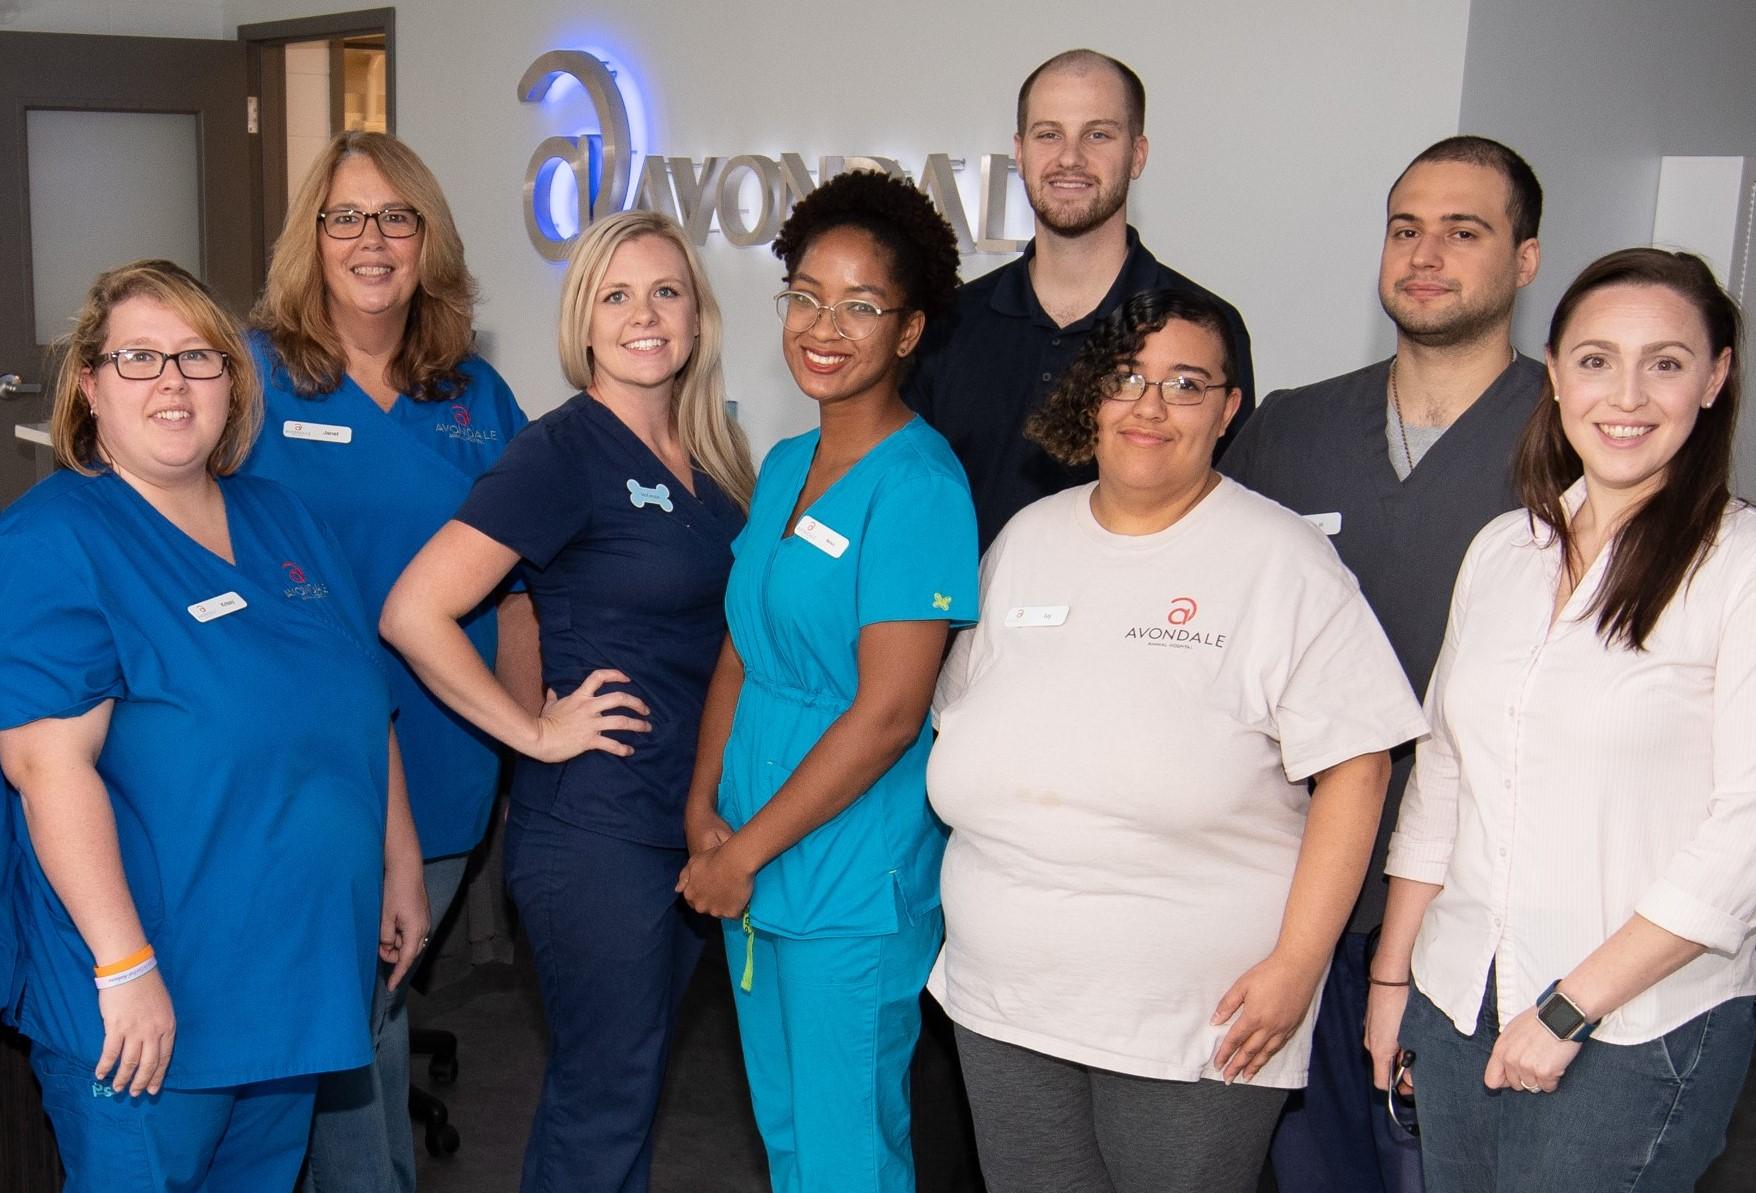 Alabama's Top Rated Local® Veterinarians Award Winner: Avondale Animal Hospital